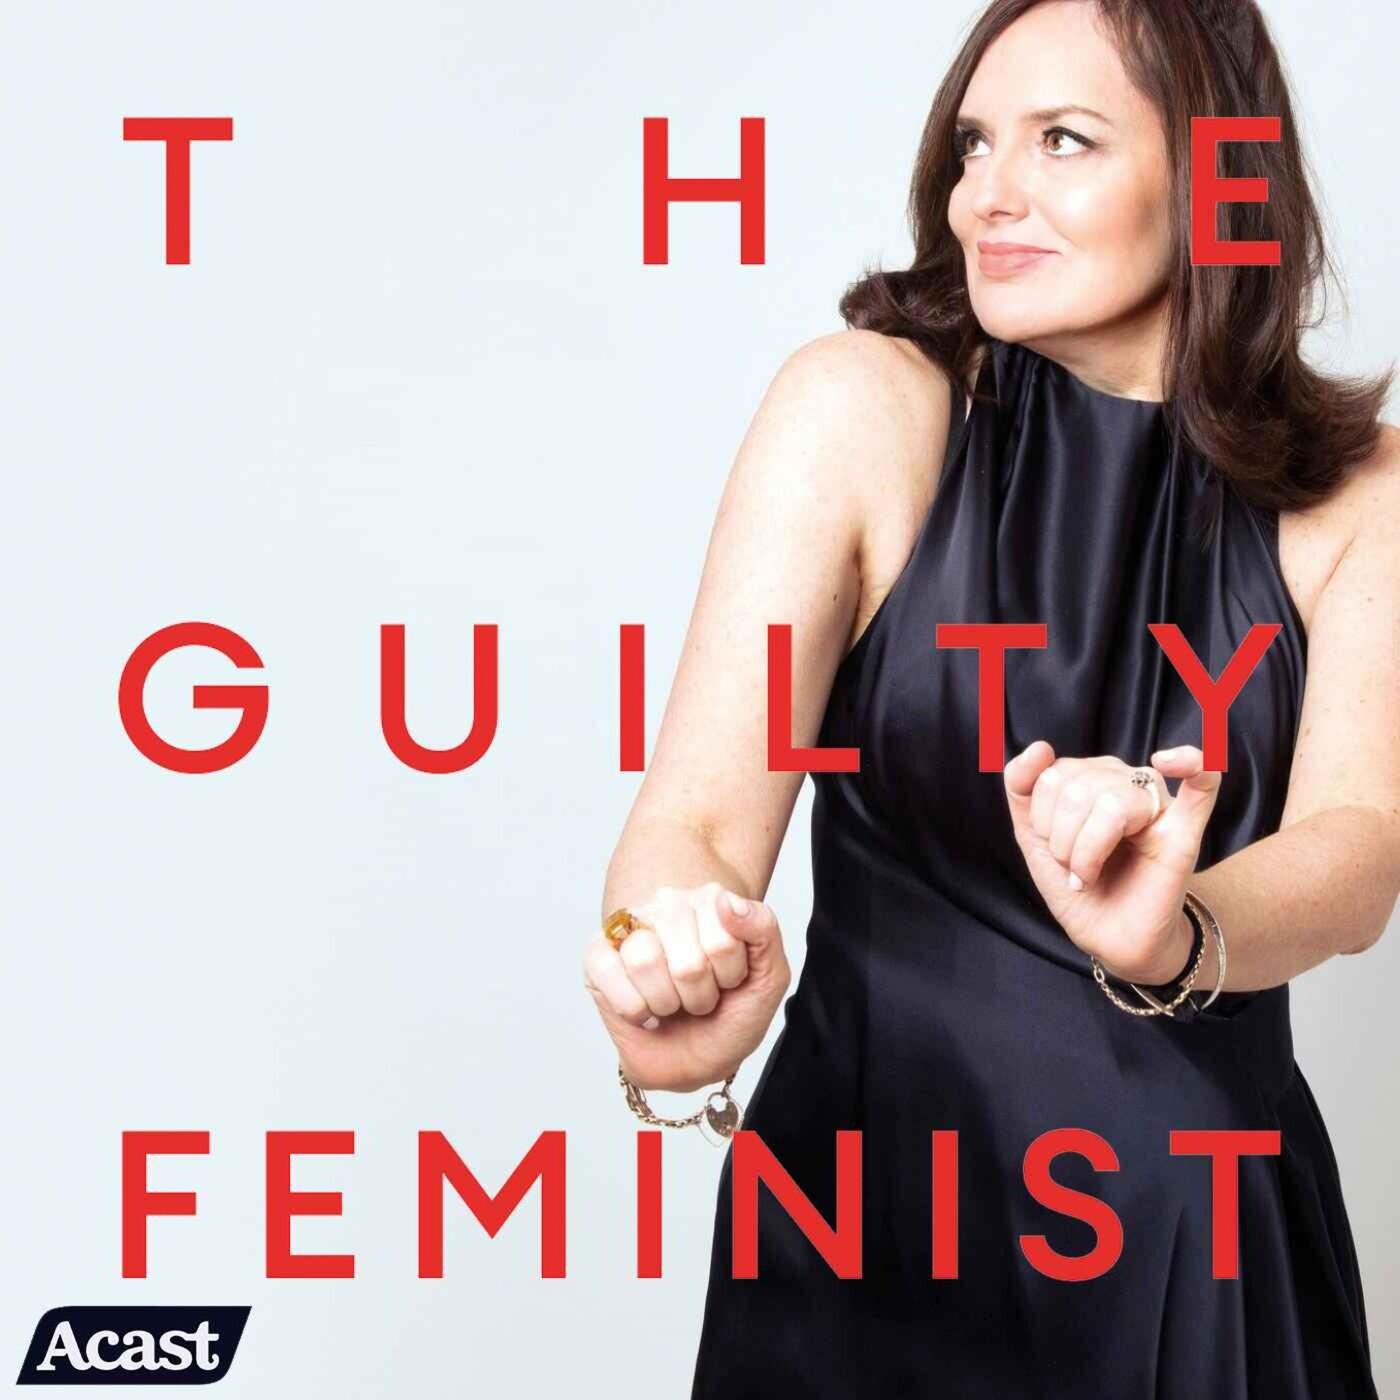 The Guilty Feminist